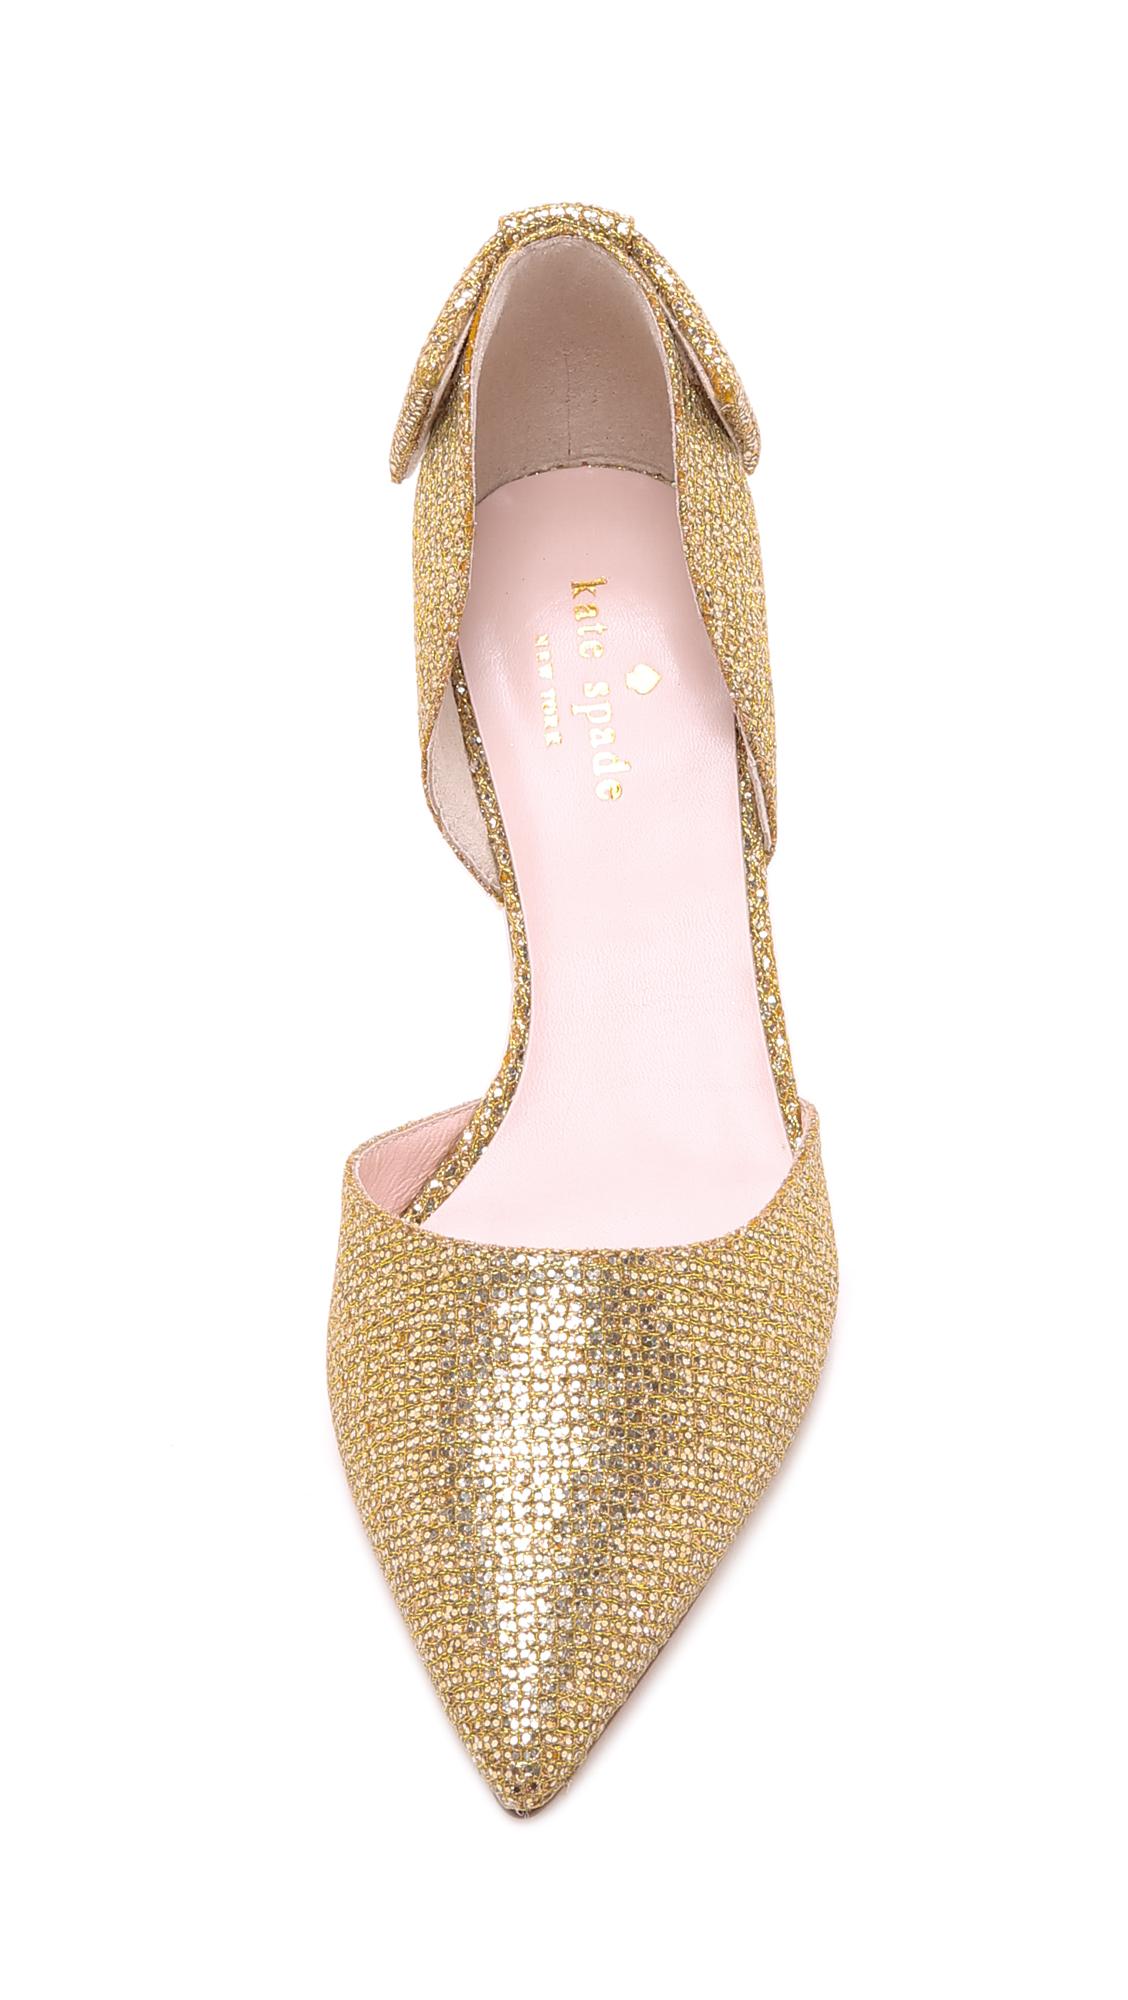 Kate spade new york Myra D'orsay Pumps - Gold in Metallic | Lyst